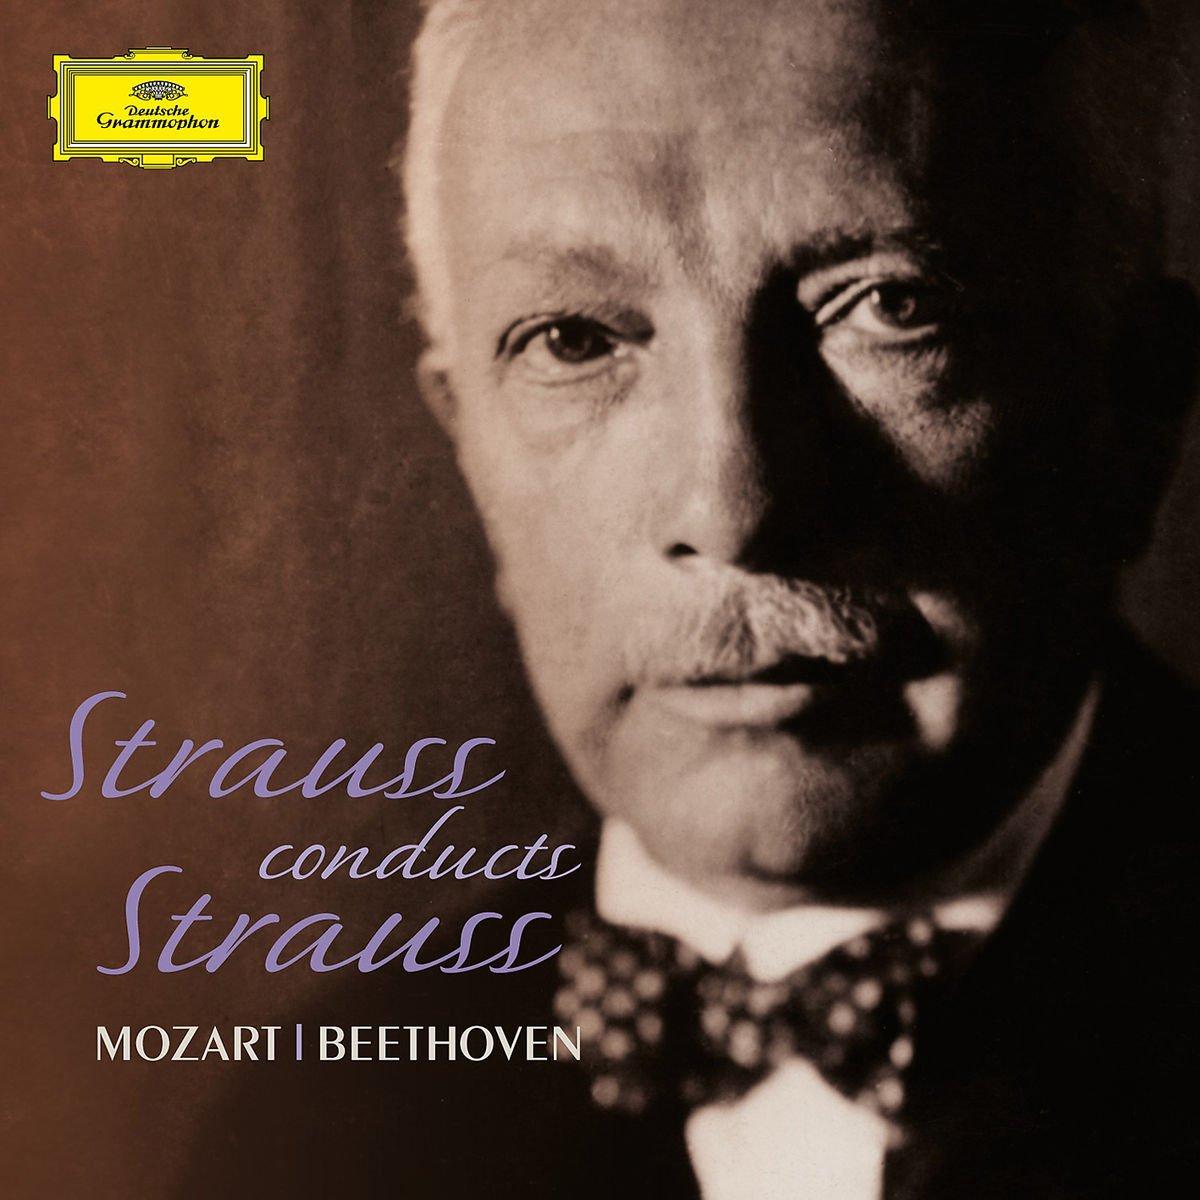 Richard Strauss (1864-1949) - Page 2 71oI8hb8h0L._SL1200_